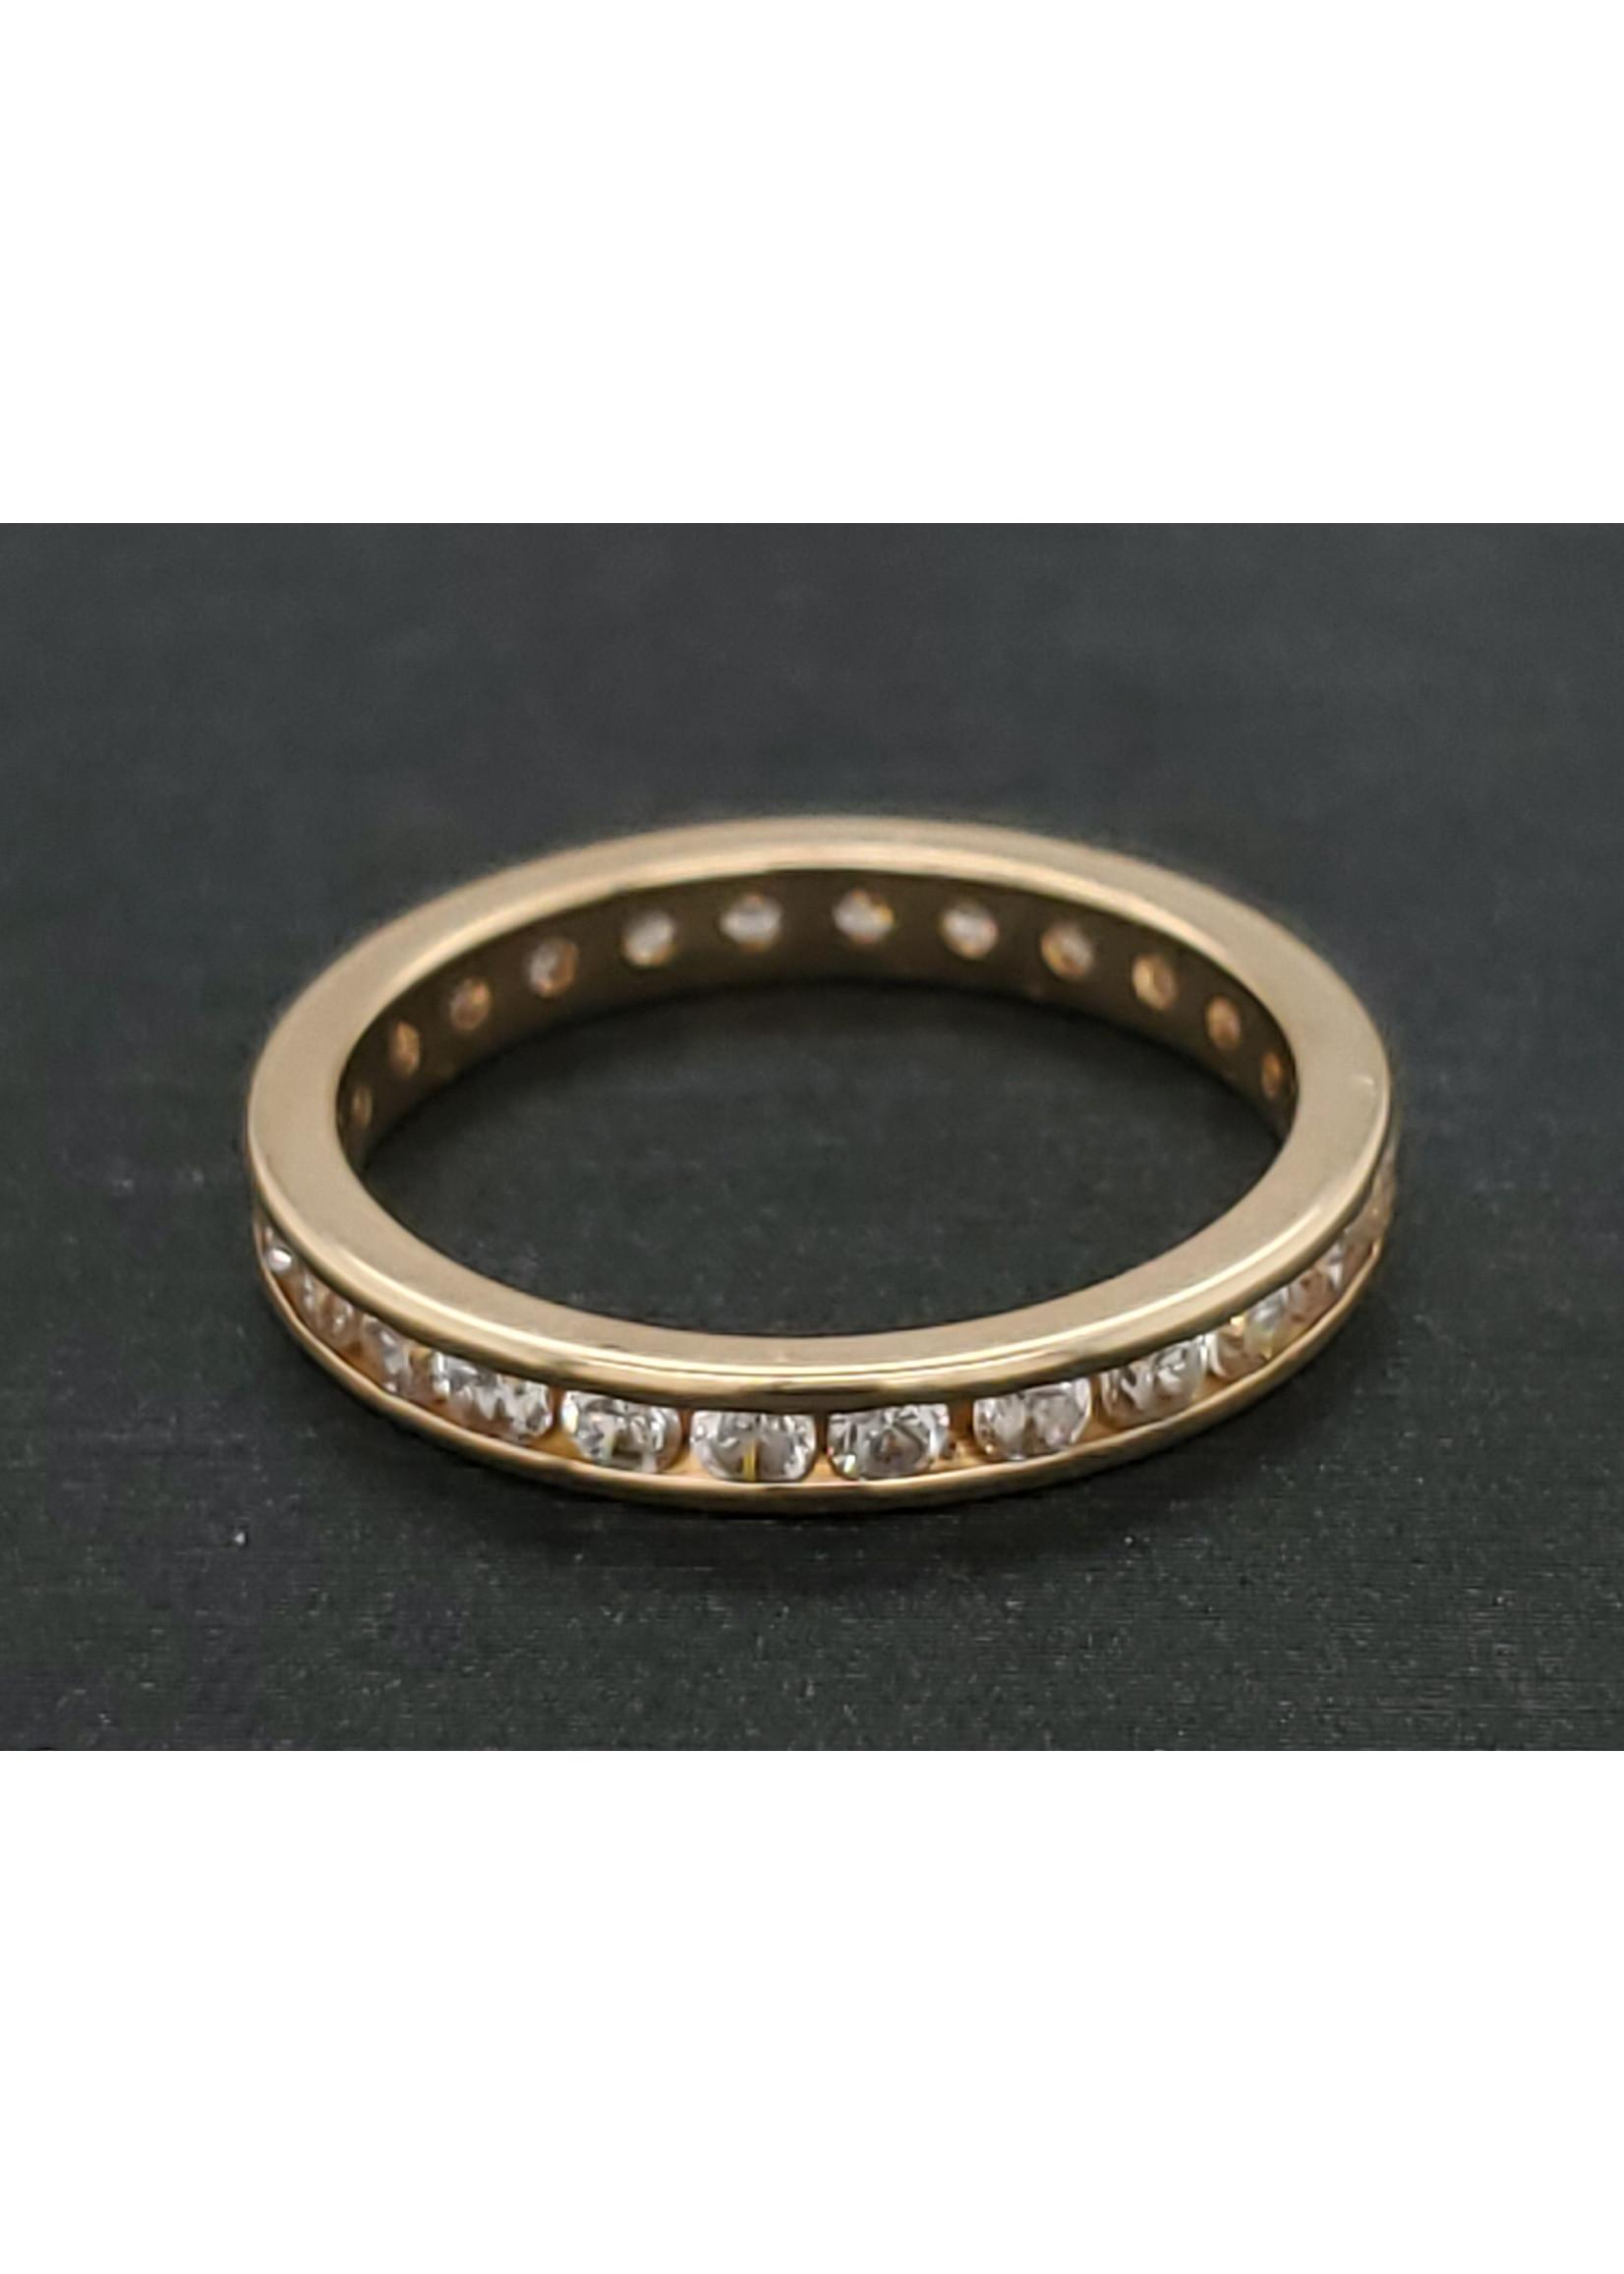 Vintage Jewellery Vintage CZ Band | Sz 5.5 4.8mm band